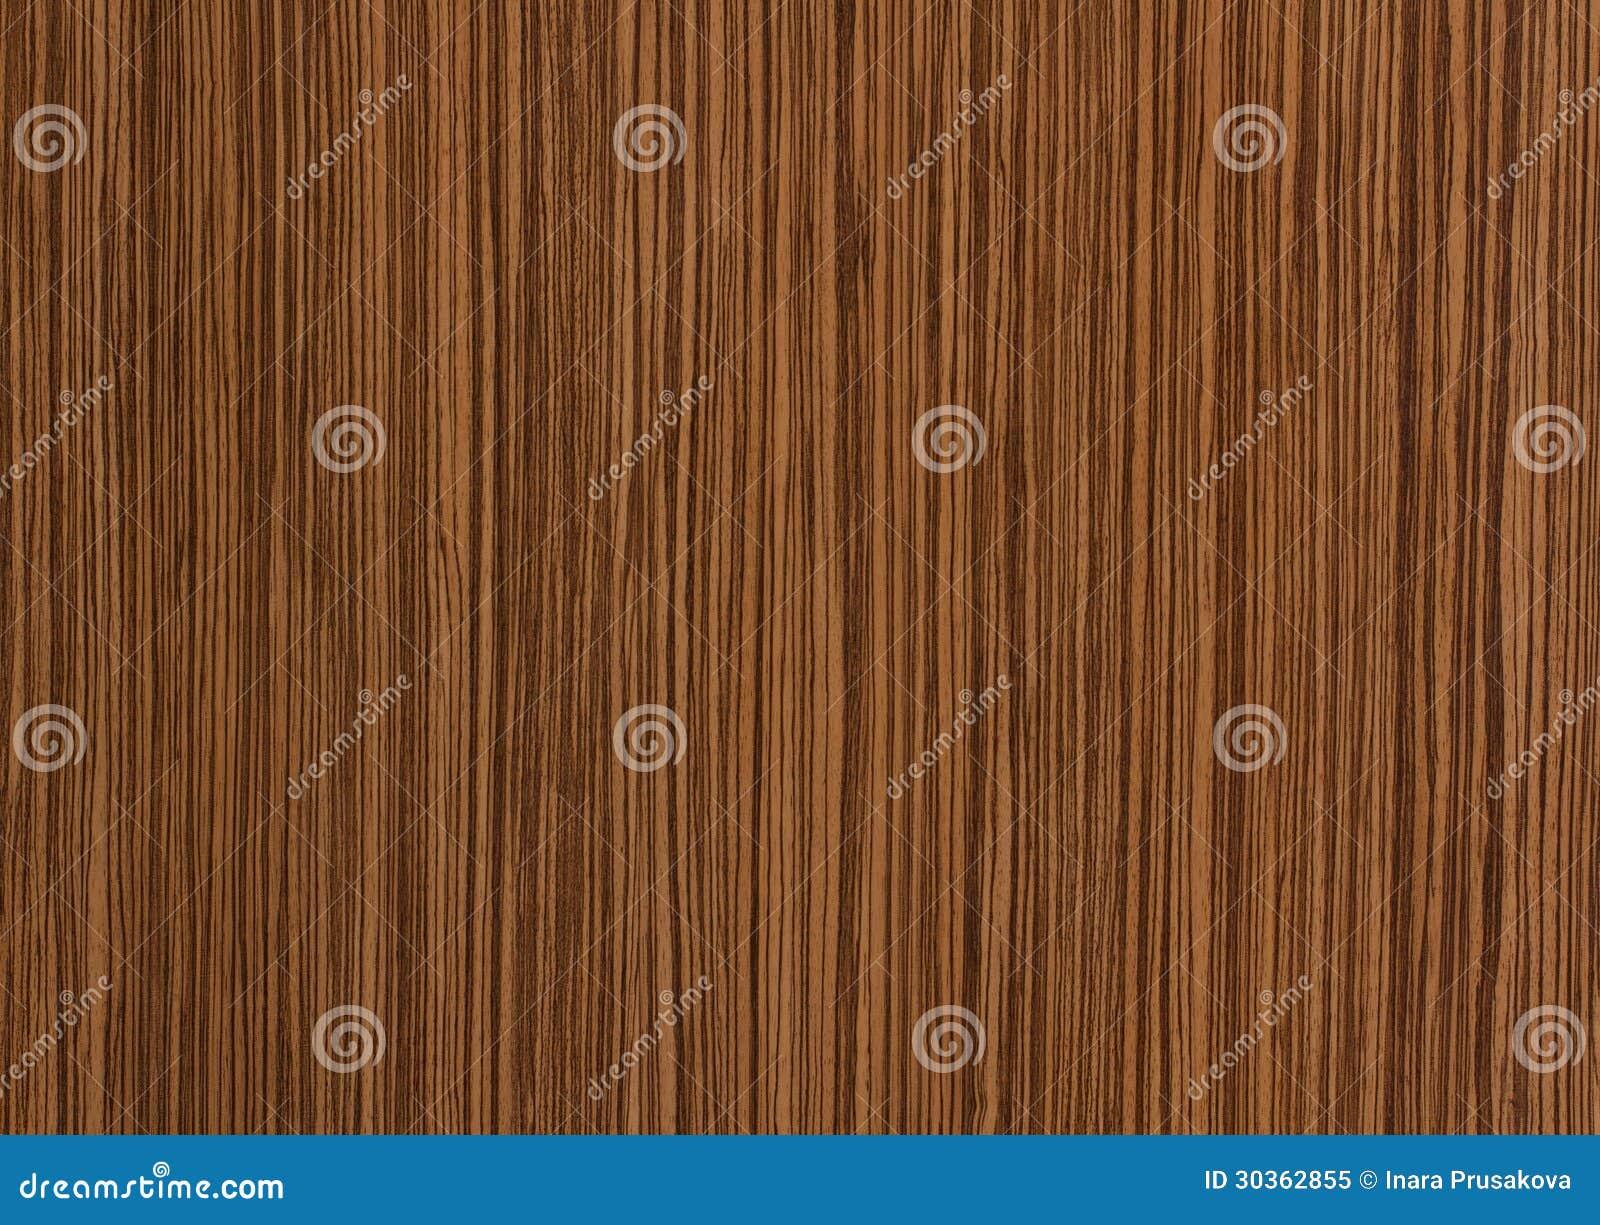 Zebrano Wood Texture Grain Background Royalty Free Stock